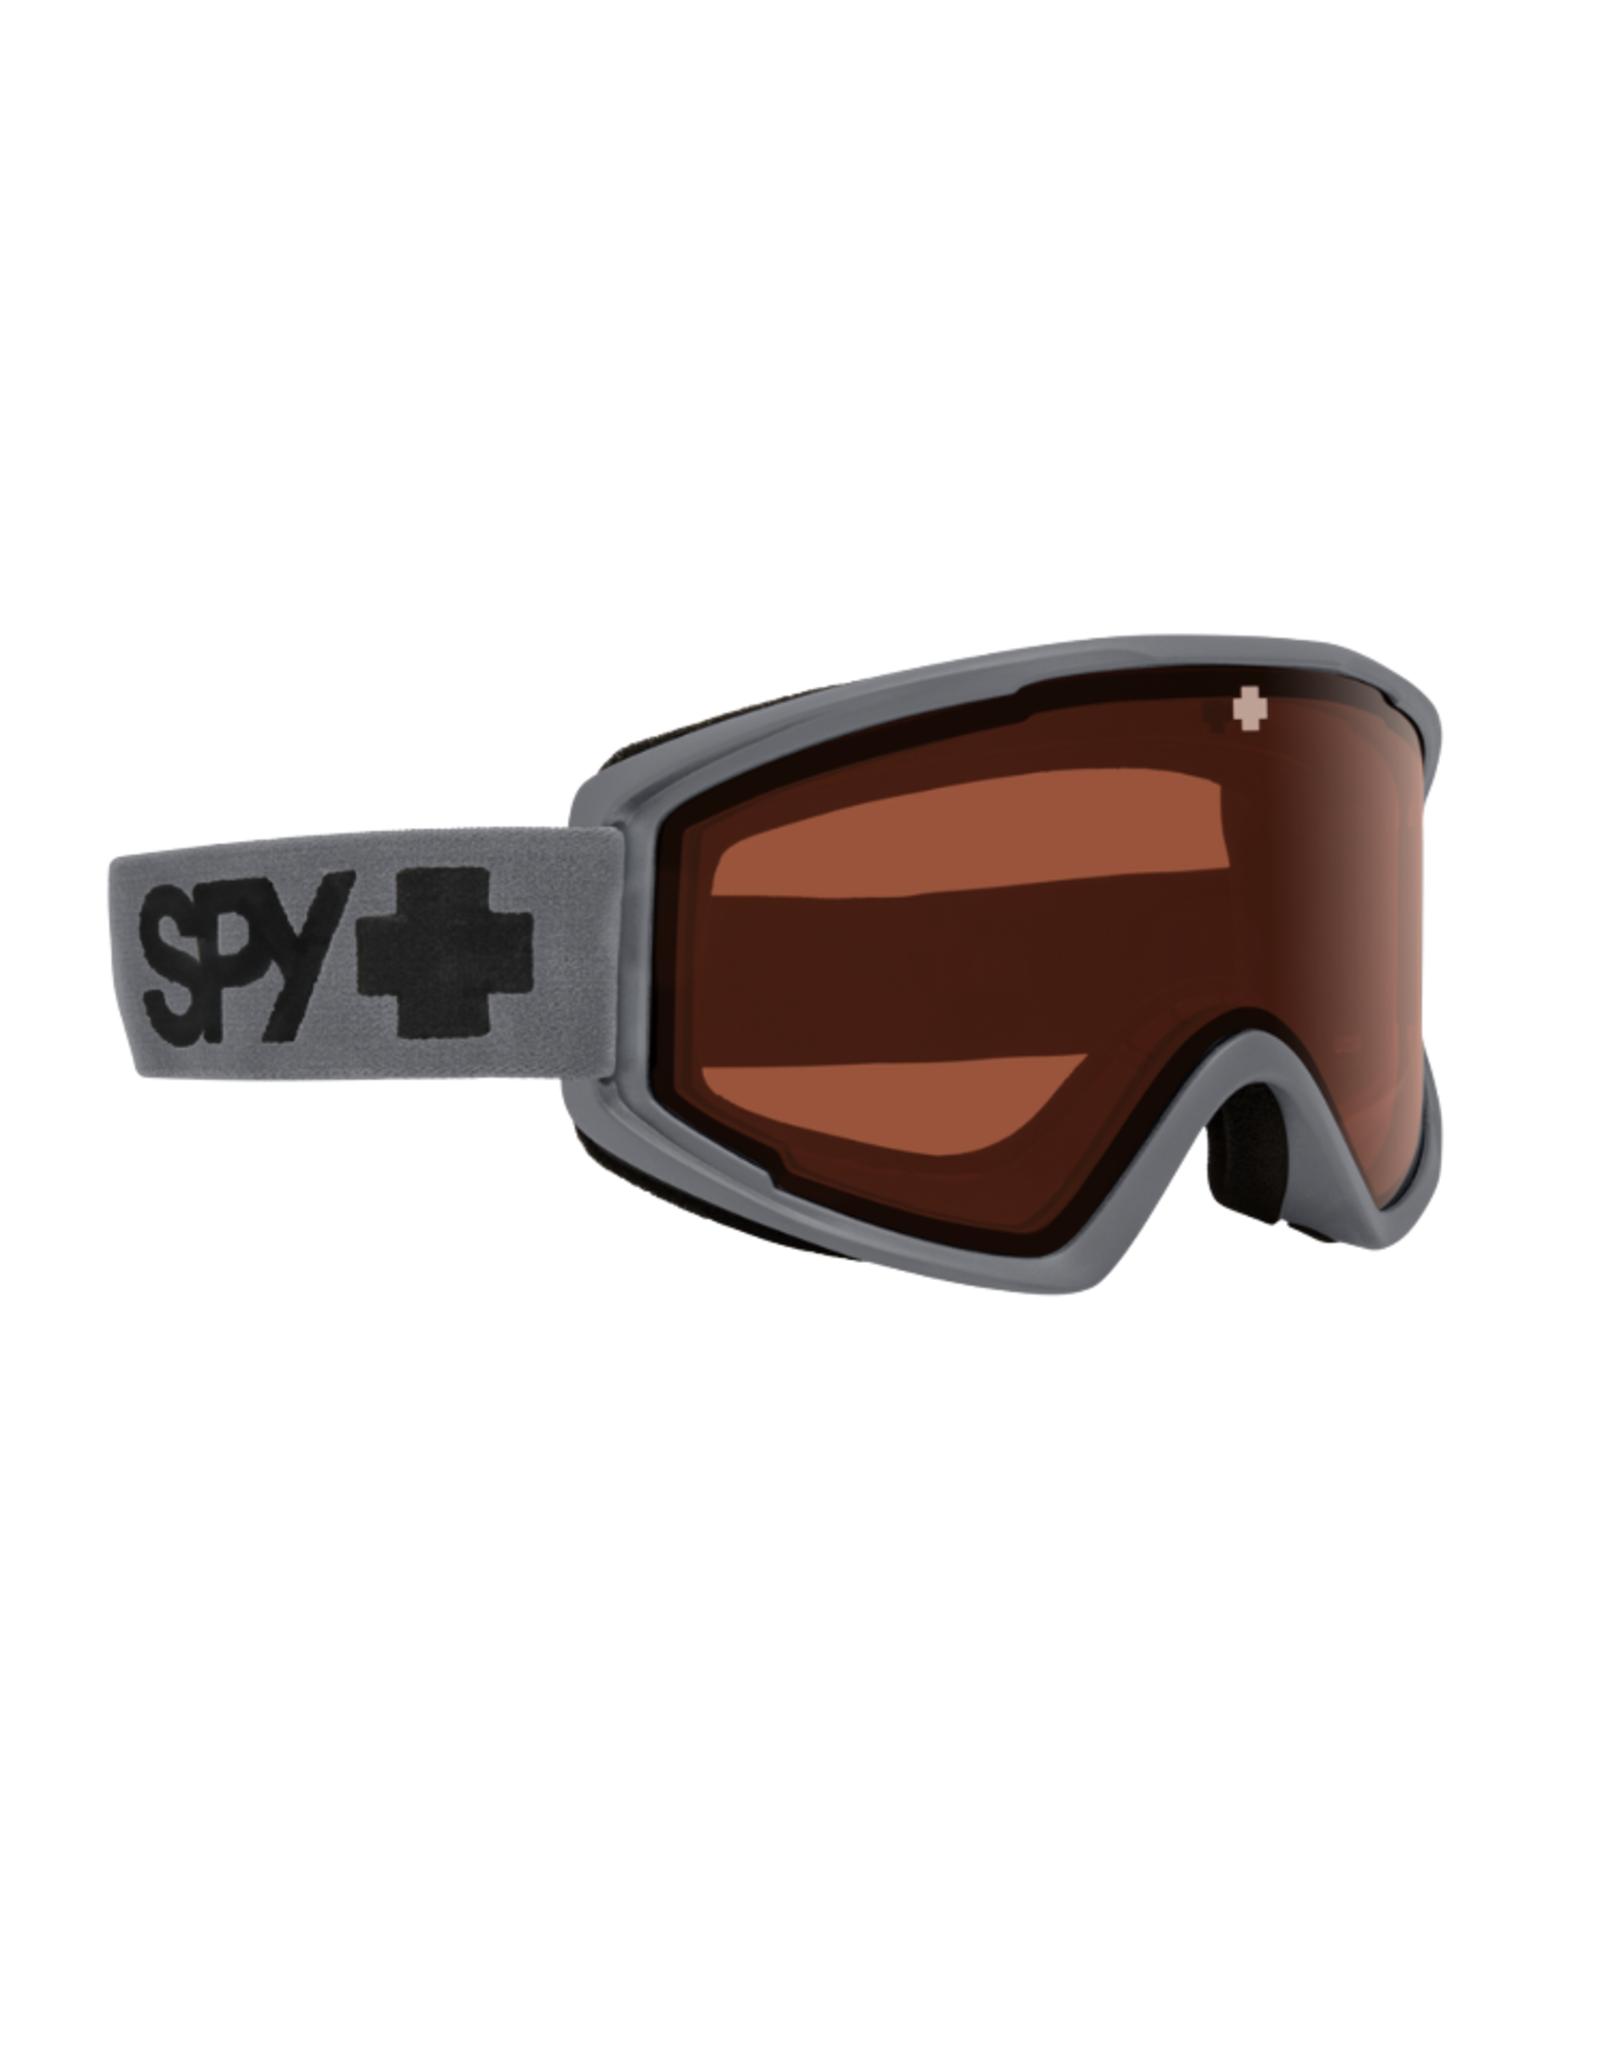 Spy SPY Crusher Elite Matte Gray - HD LL Persimmon